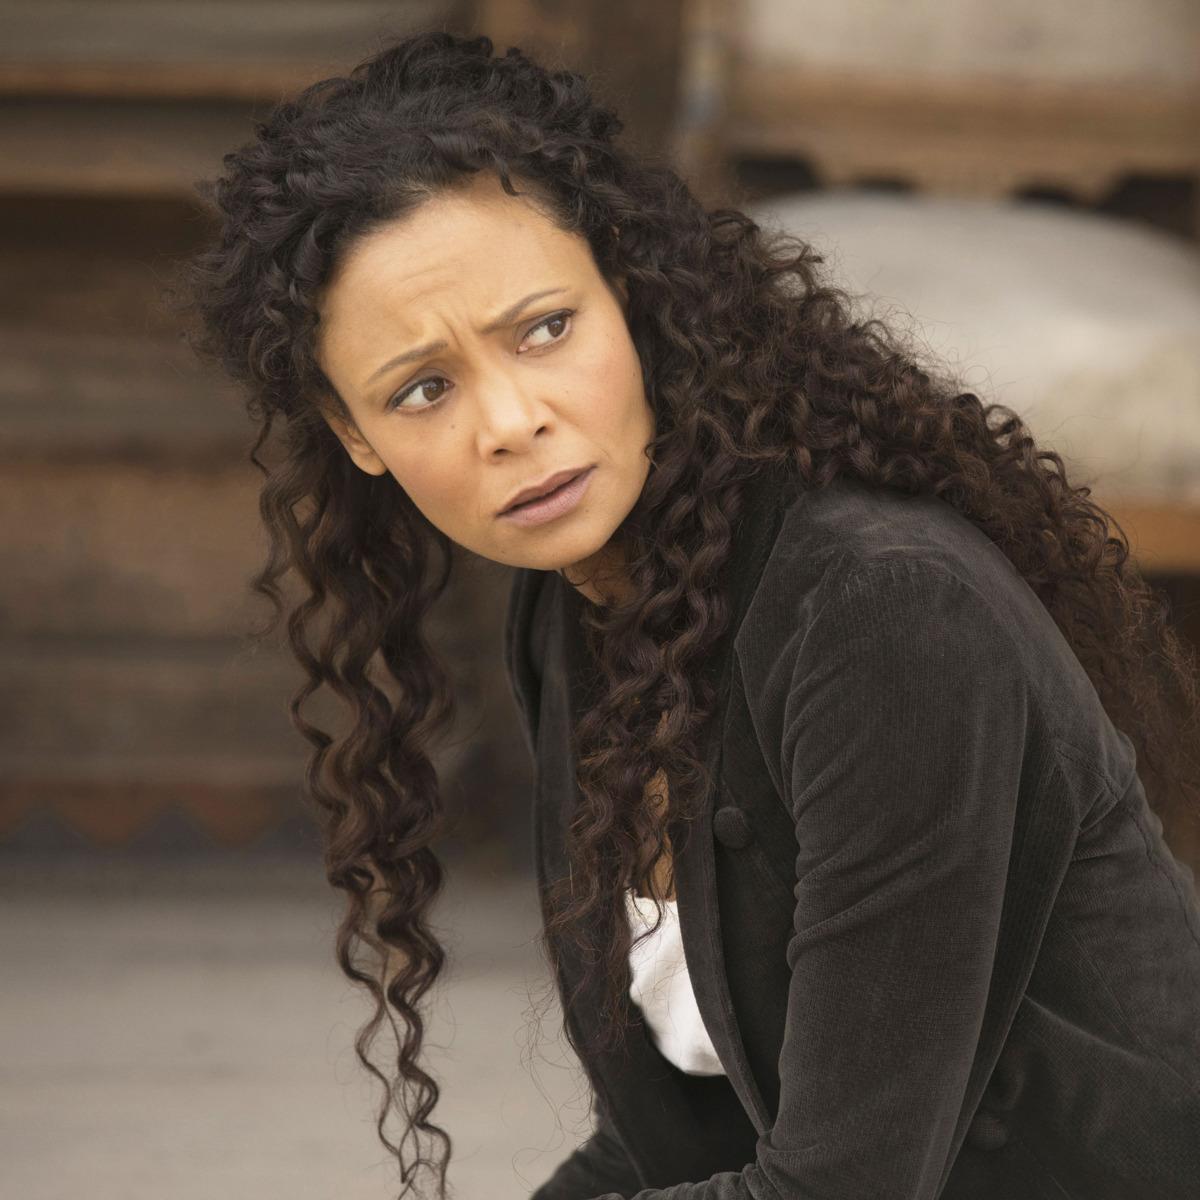 Westworld' Recap Season 2 Episode 6: 'Phase Space'